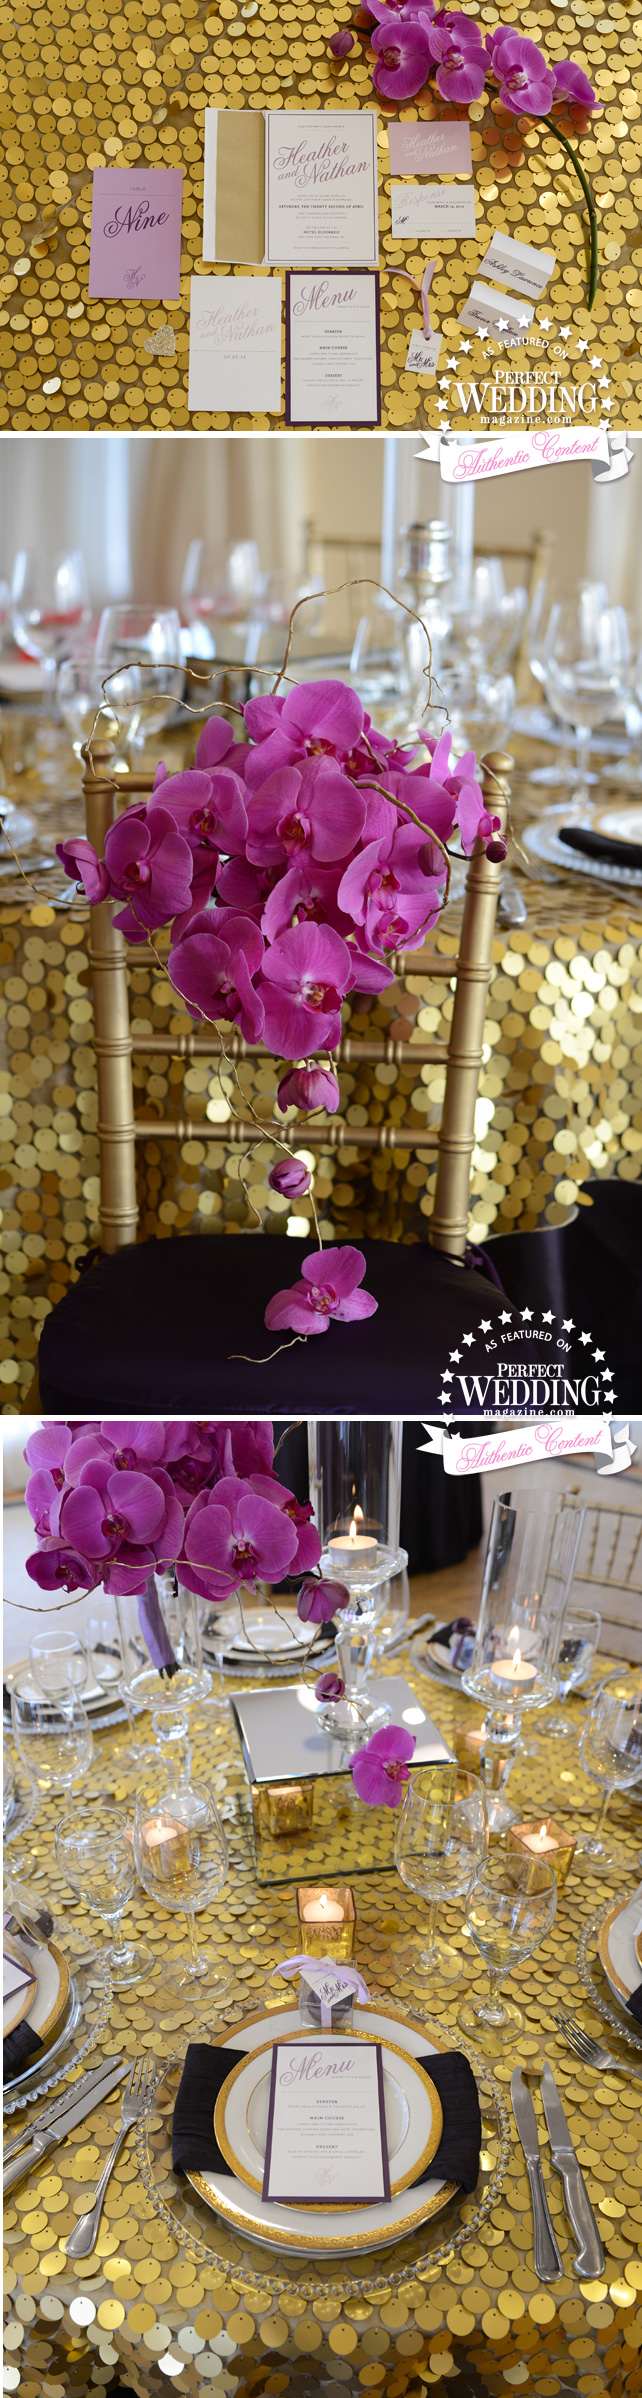 ORCHID VELVET STYLE SHOOT, Perfect Wedding Magazine, Radiant Orchid, Wedding Decor, Wedding Flowers, orchids Weddings, Suzanne Le Stage, Wedding Cakes, El Dorado, Okanagan Weddings ,